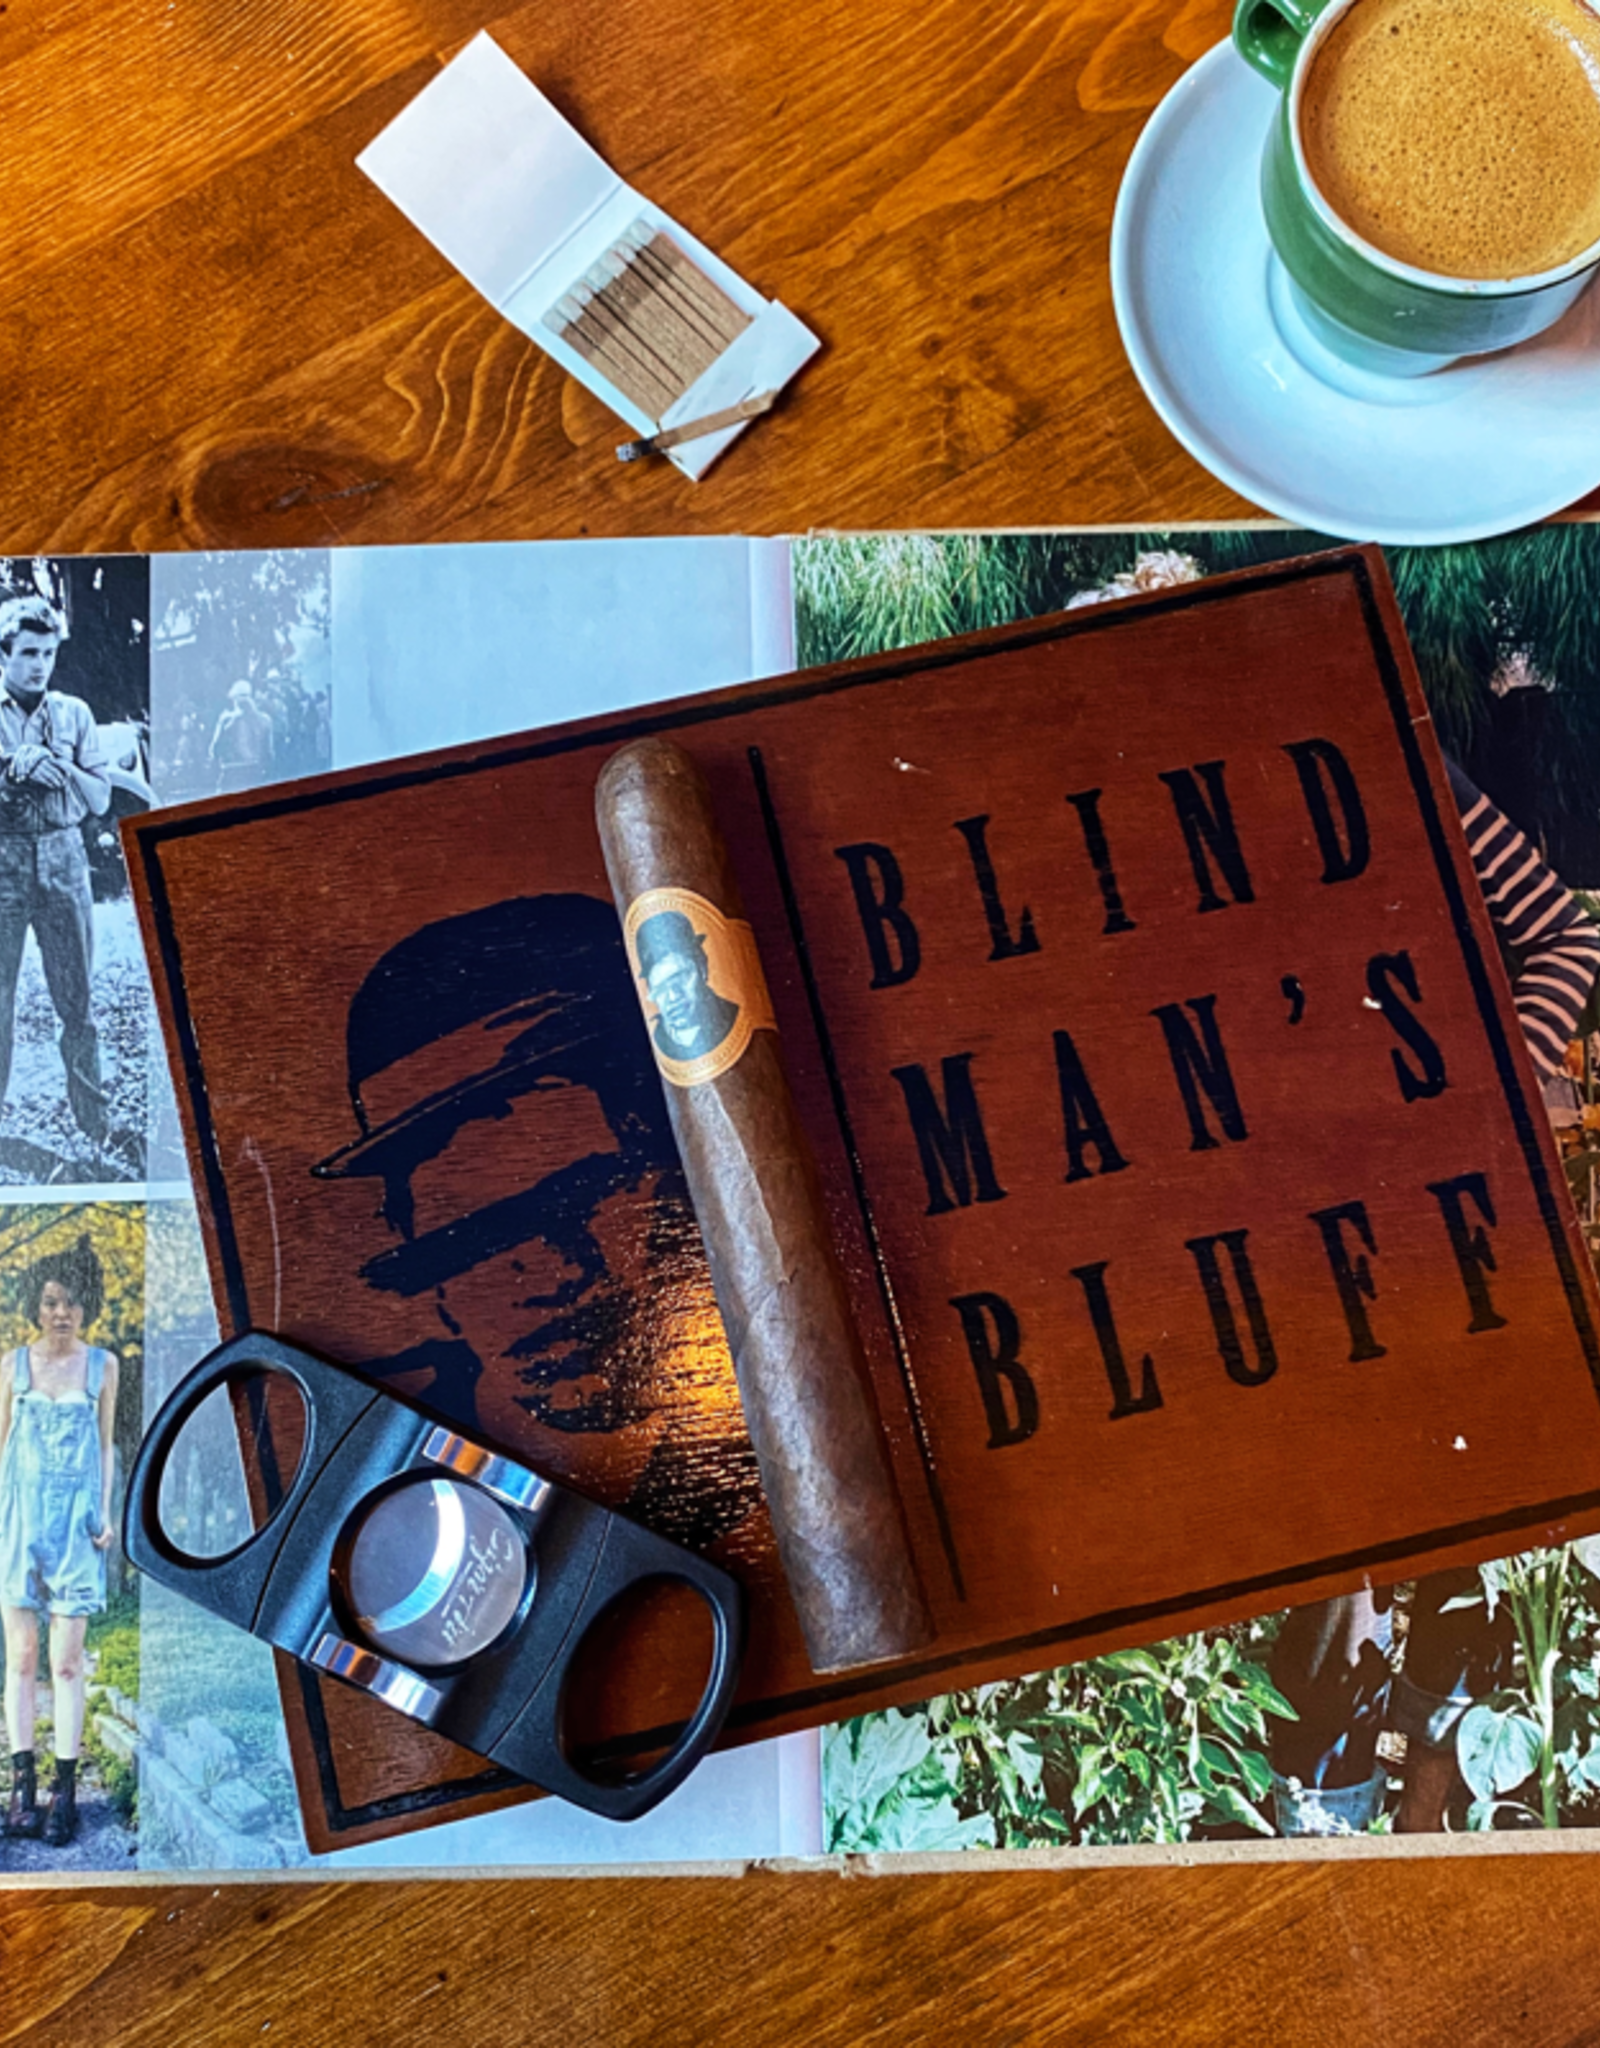 Caldwell Cigar Co Blind Man's Bluff Habano Toro 6 x 52